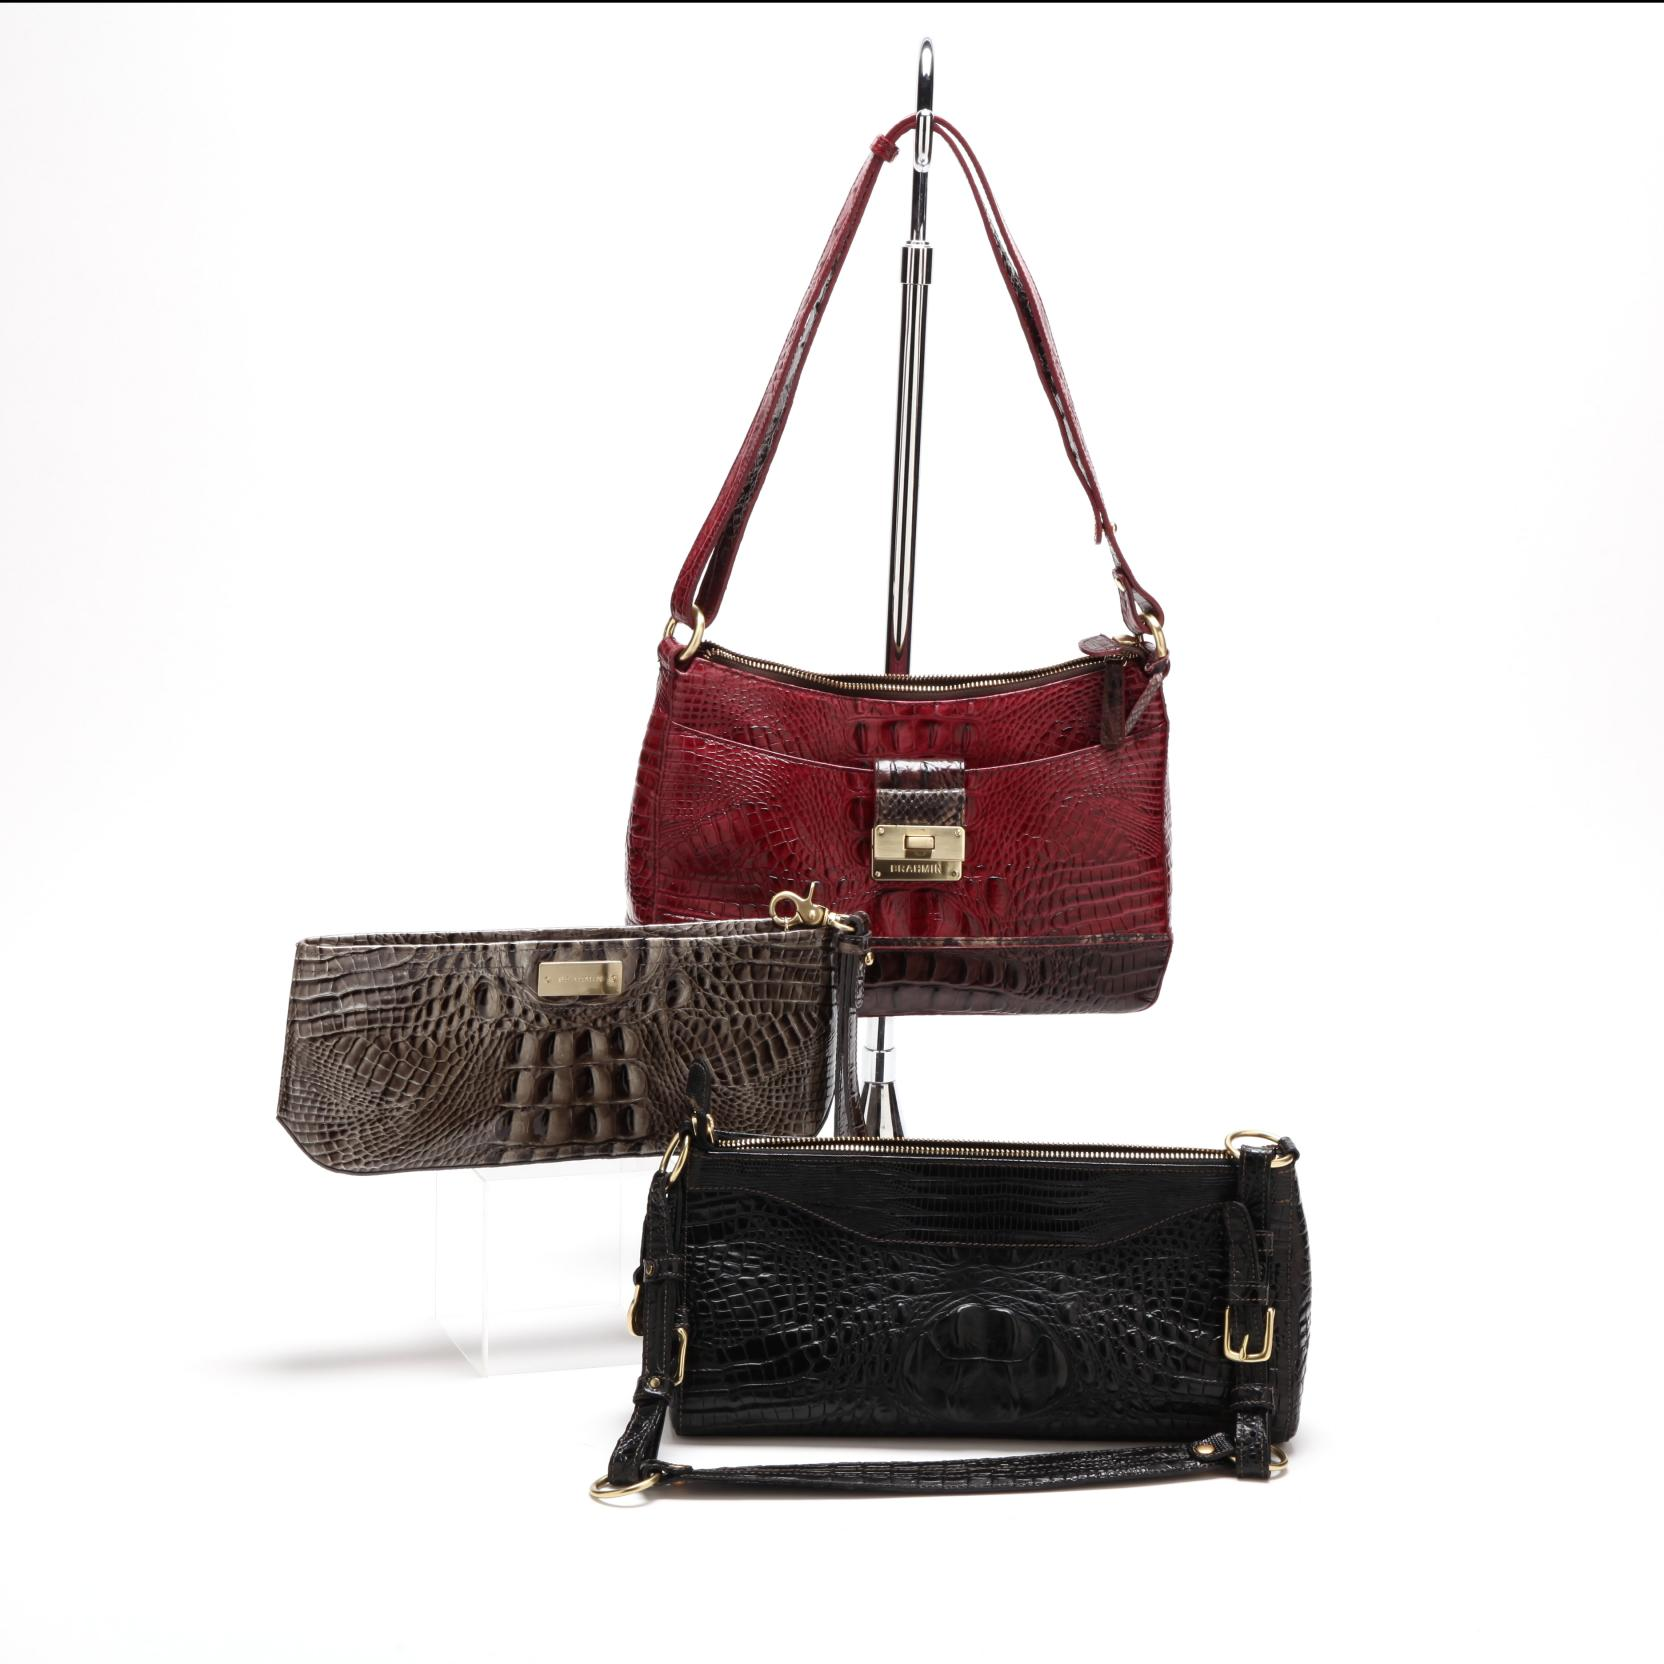 a-group-of-three-brahmin-bags